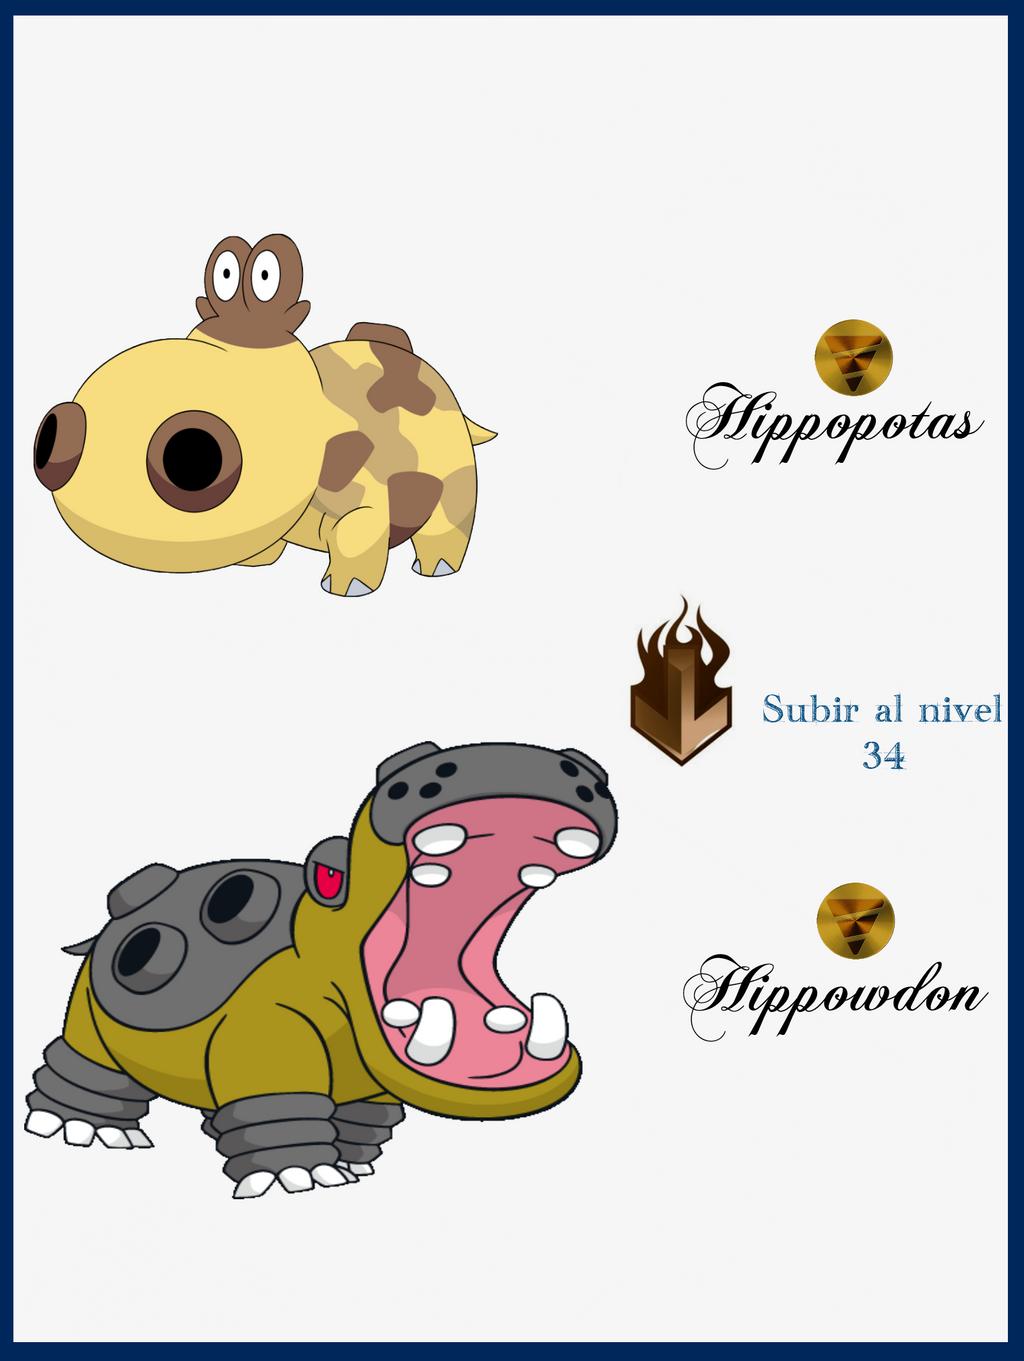 206 Hippopotas by Maxconnery on DeviantArt